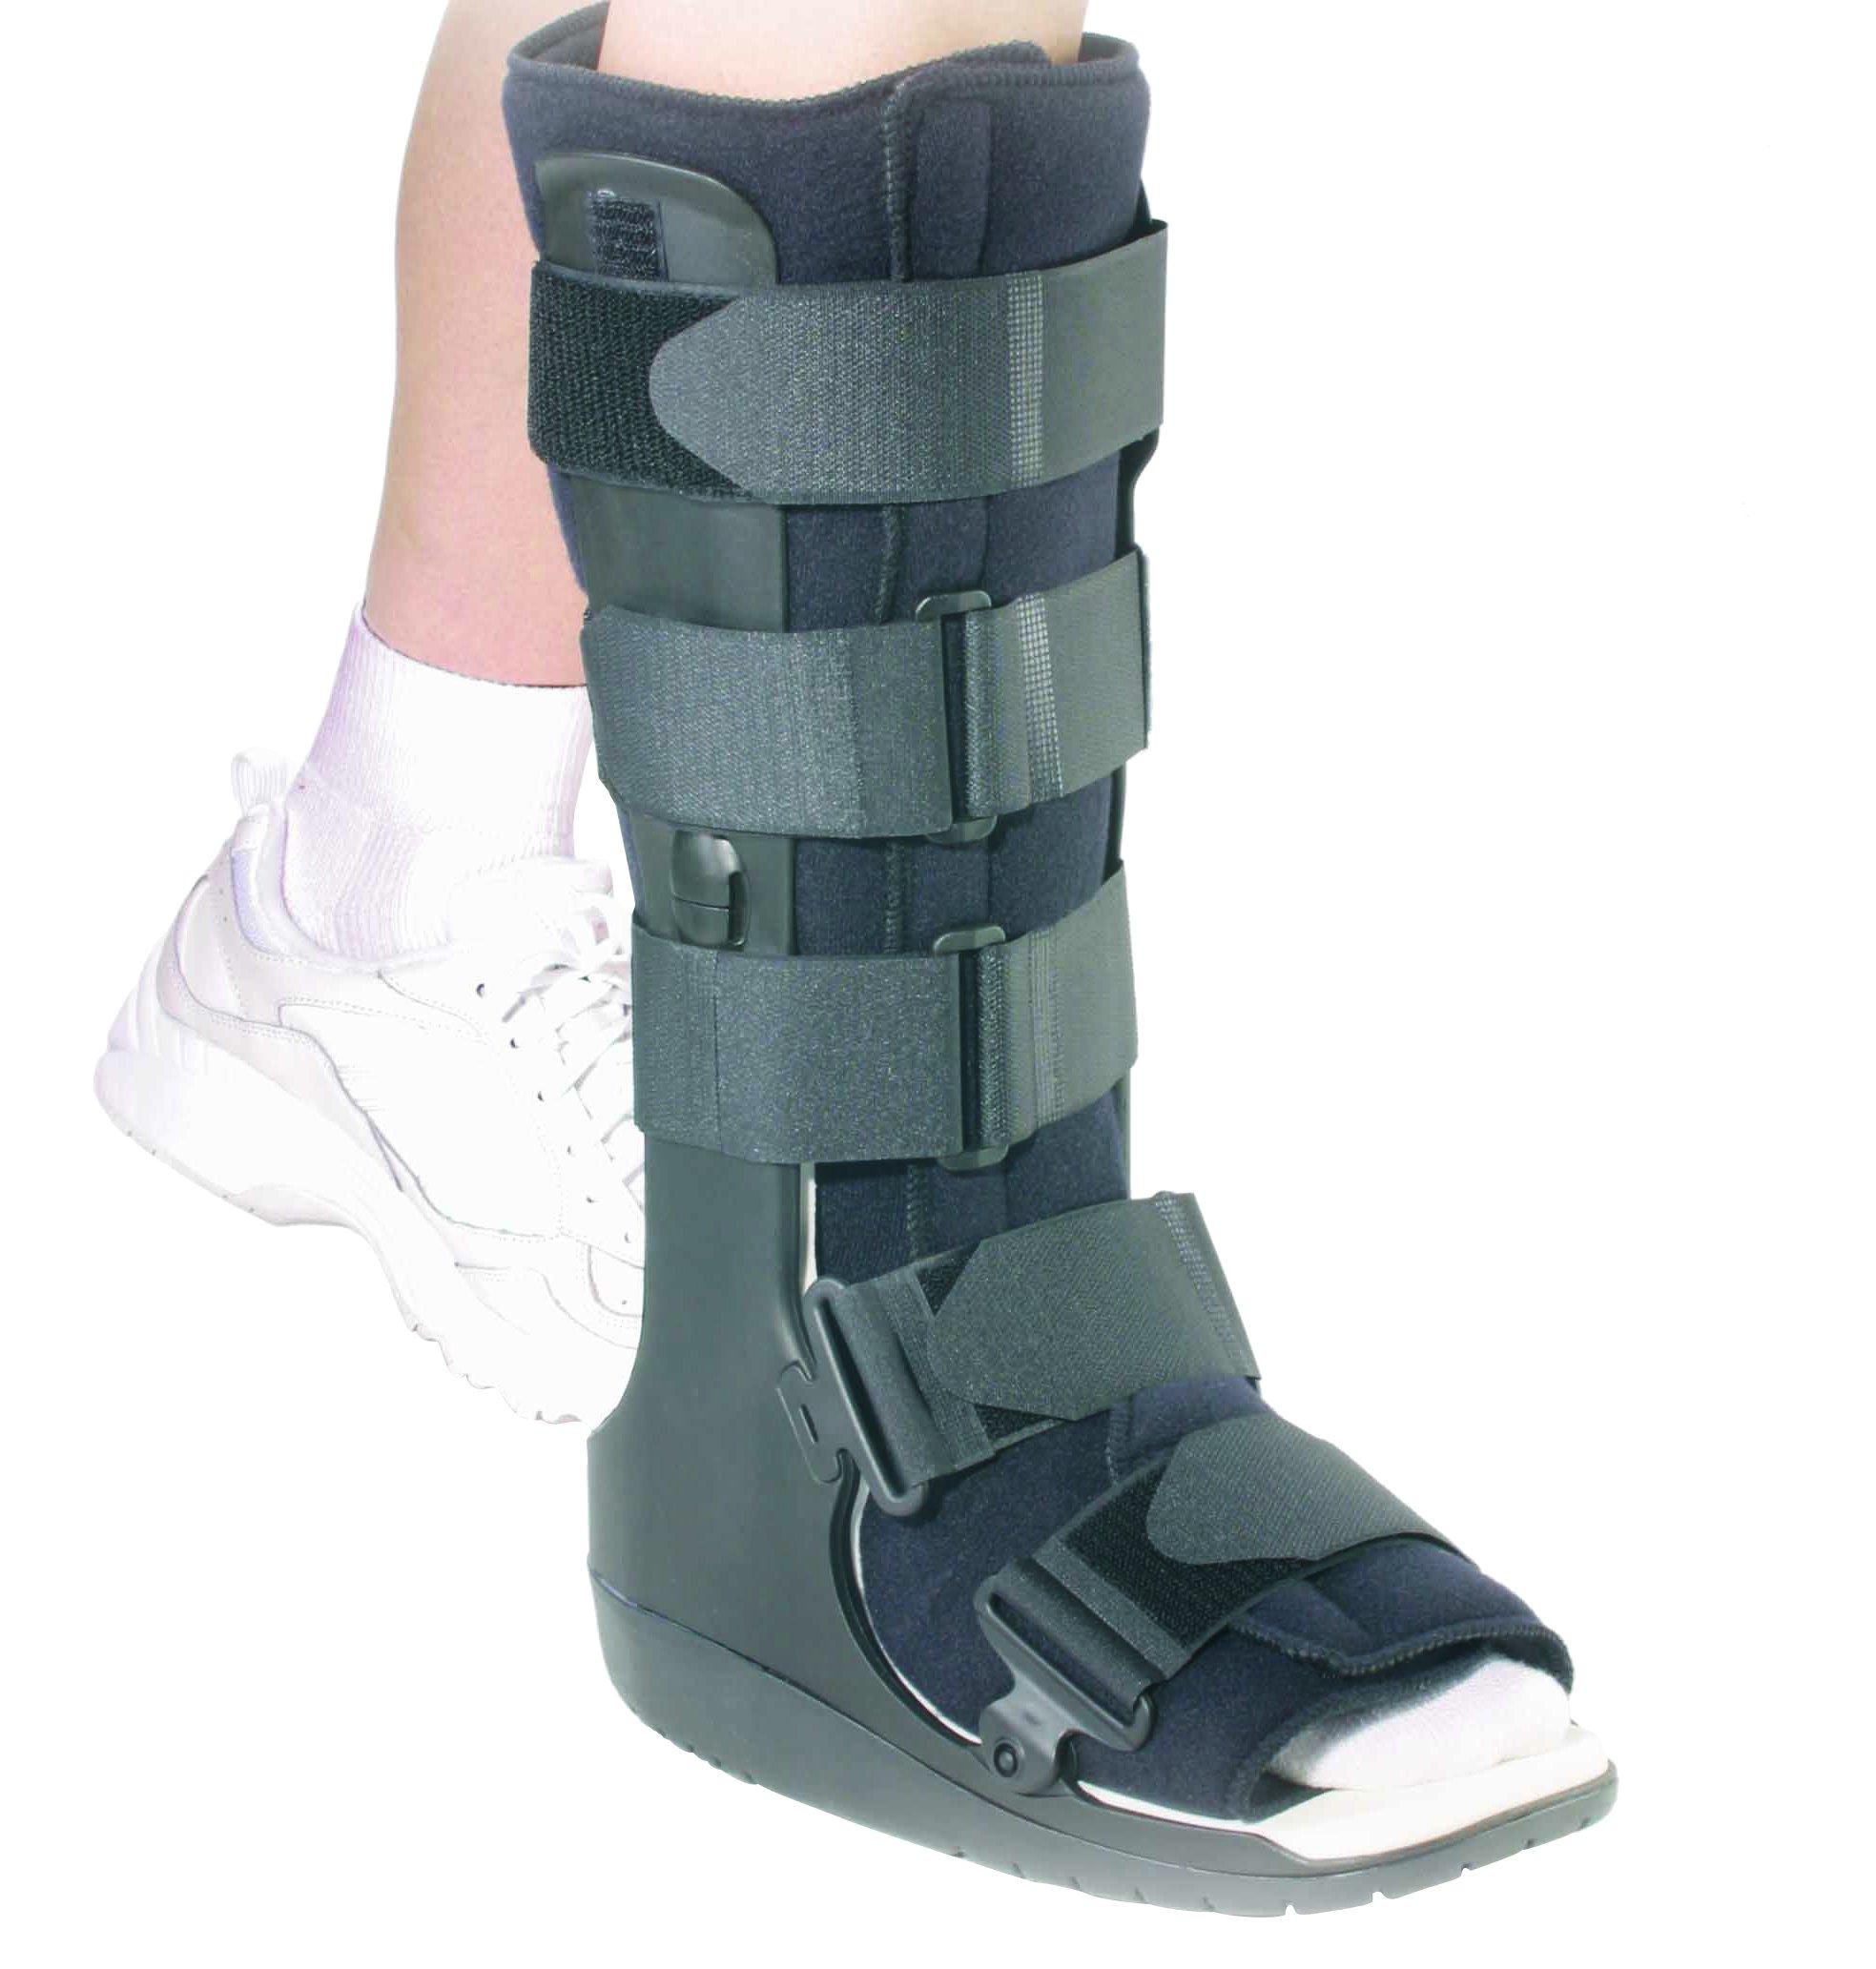 OTC High Top Leg Cast Walker Boot, Black, Small/Delux Tall by OTC